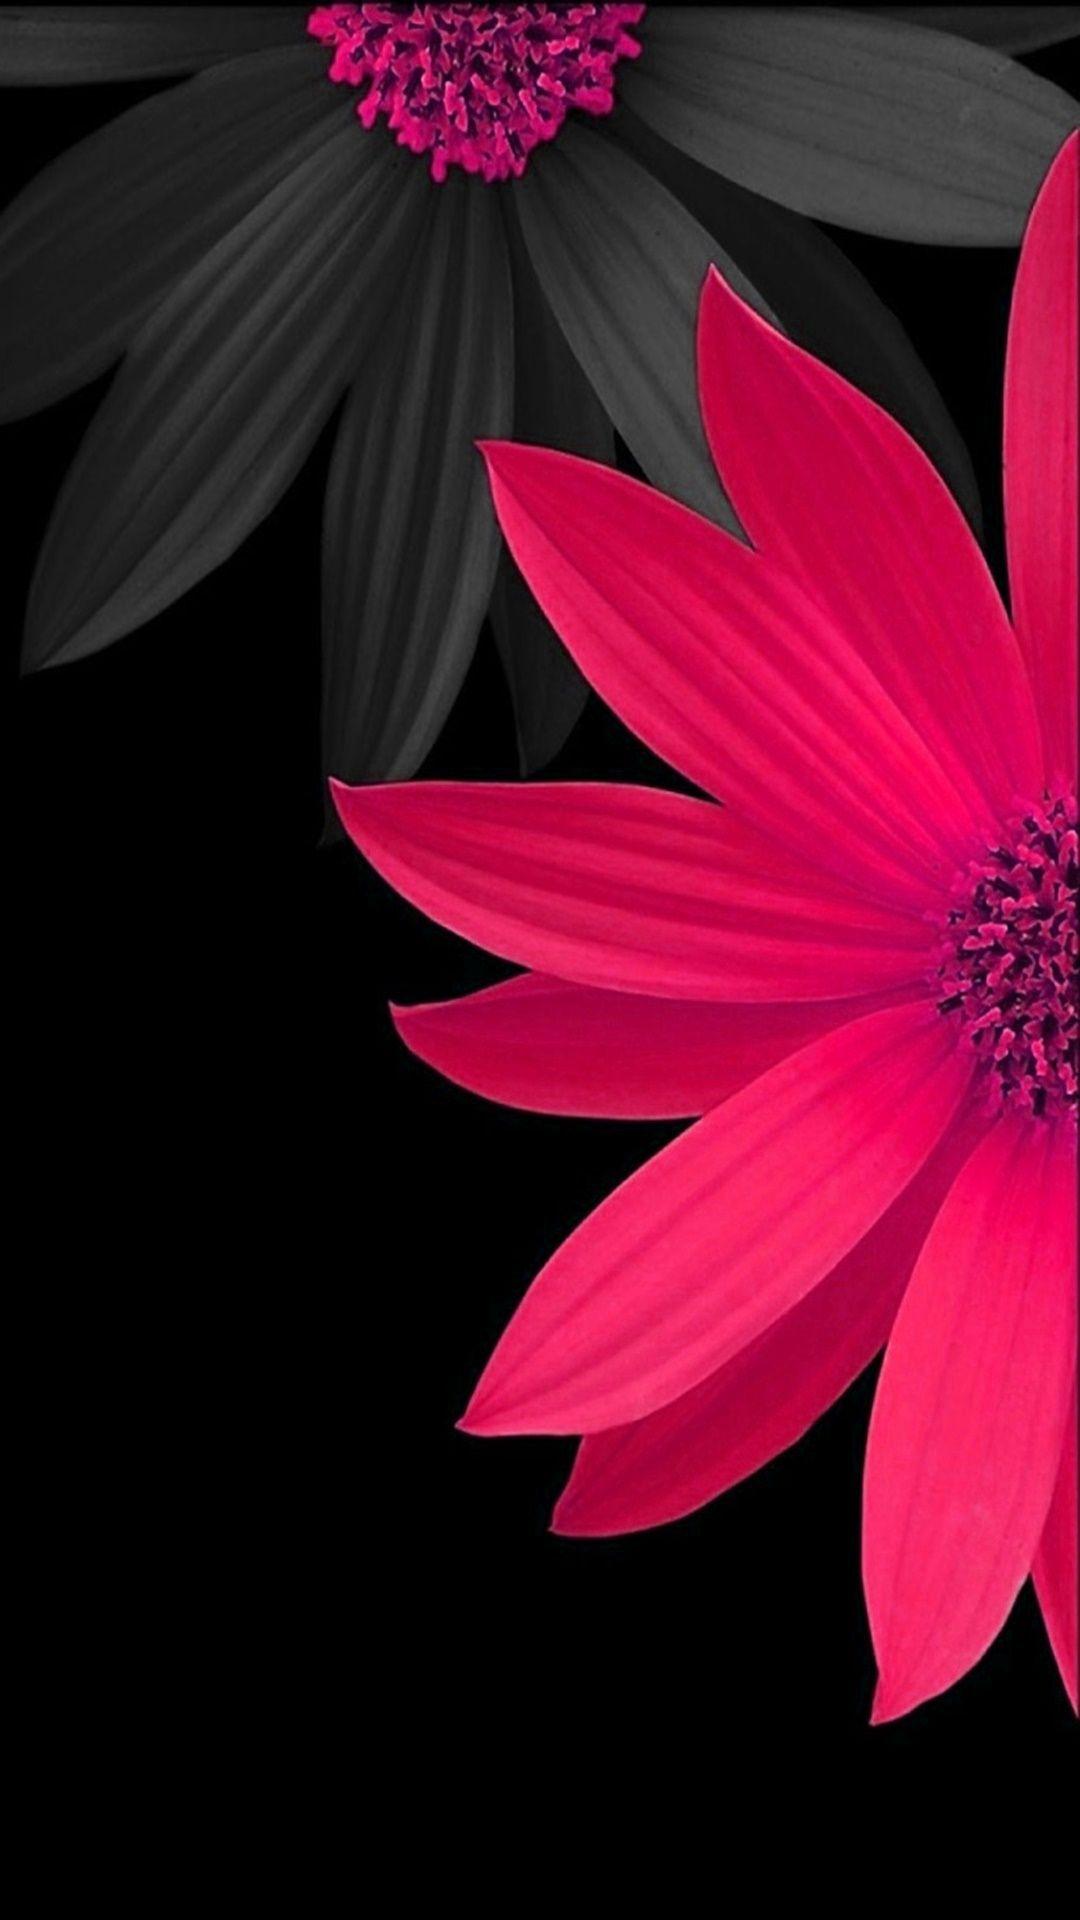 pink #black #flower #wallpaper #background | wallpapers